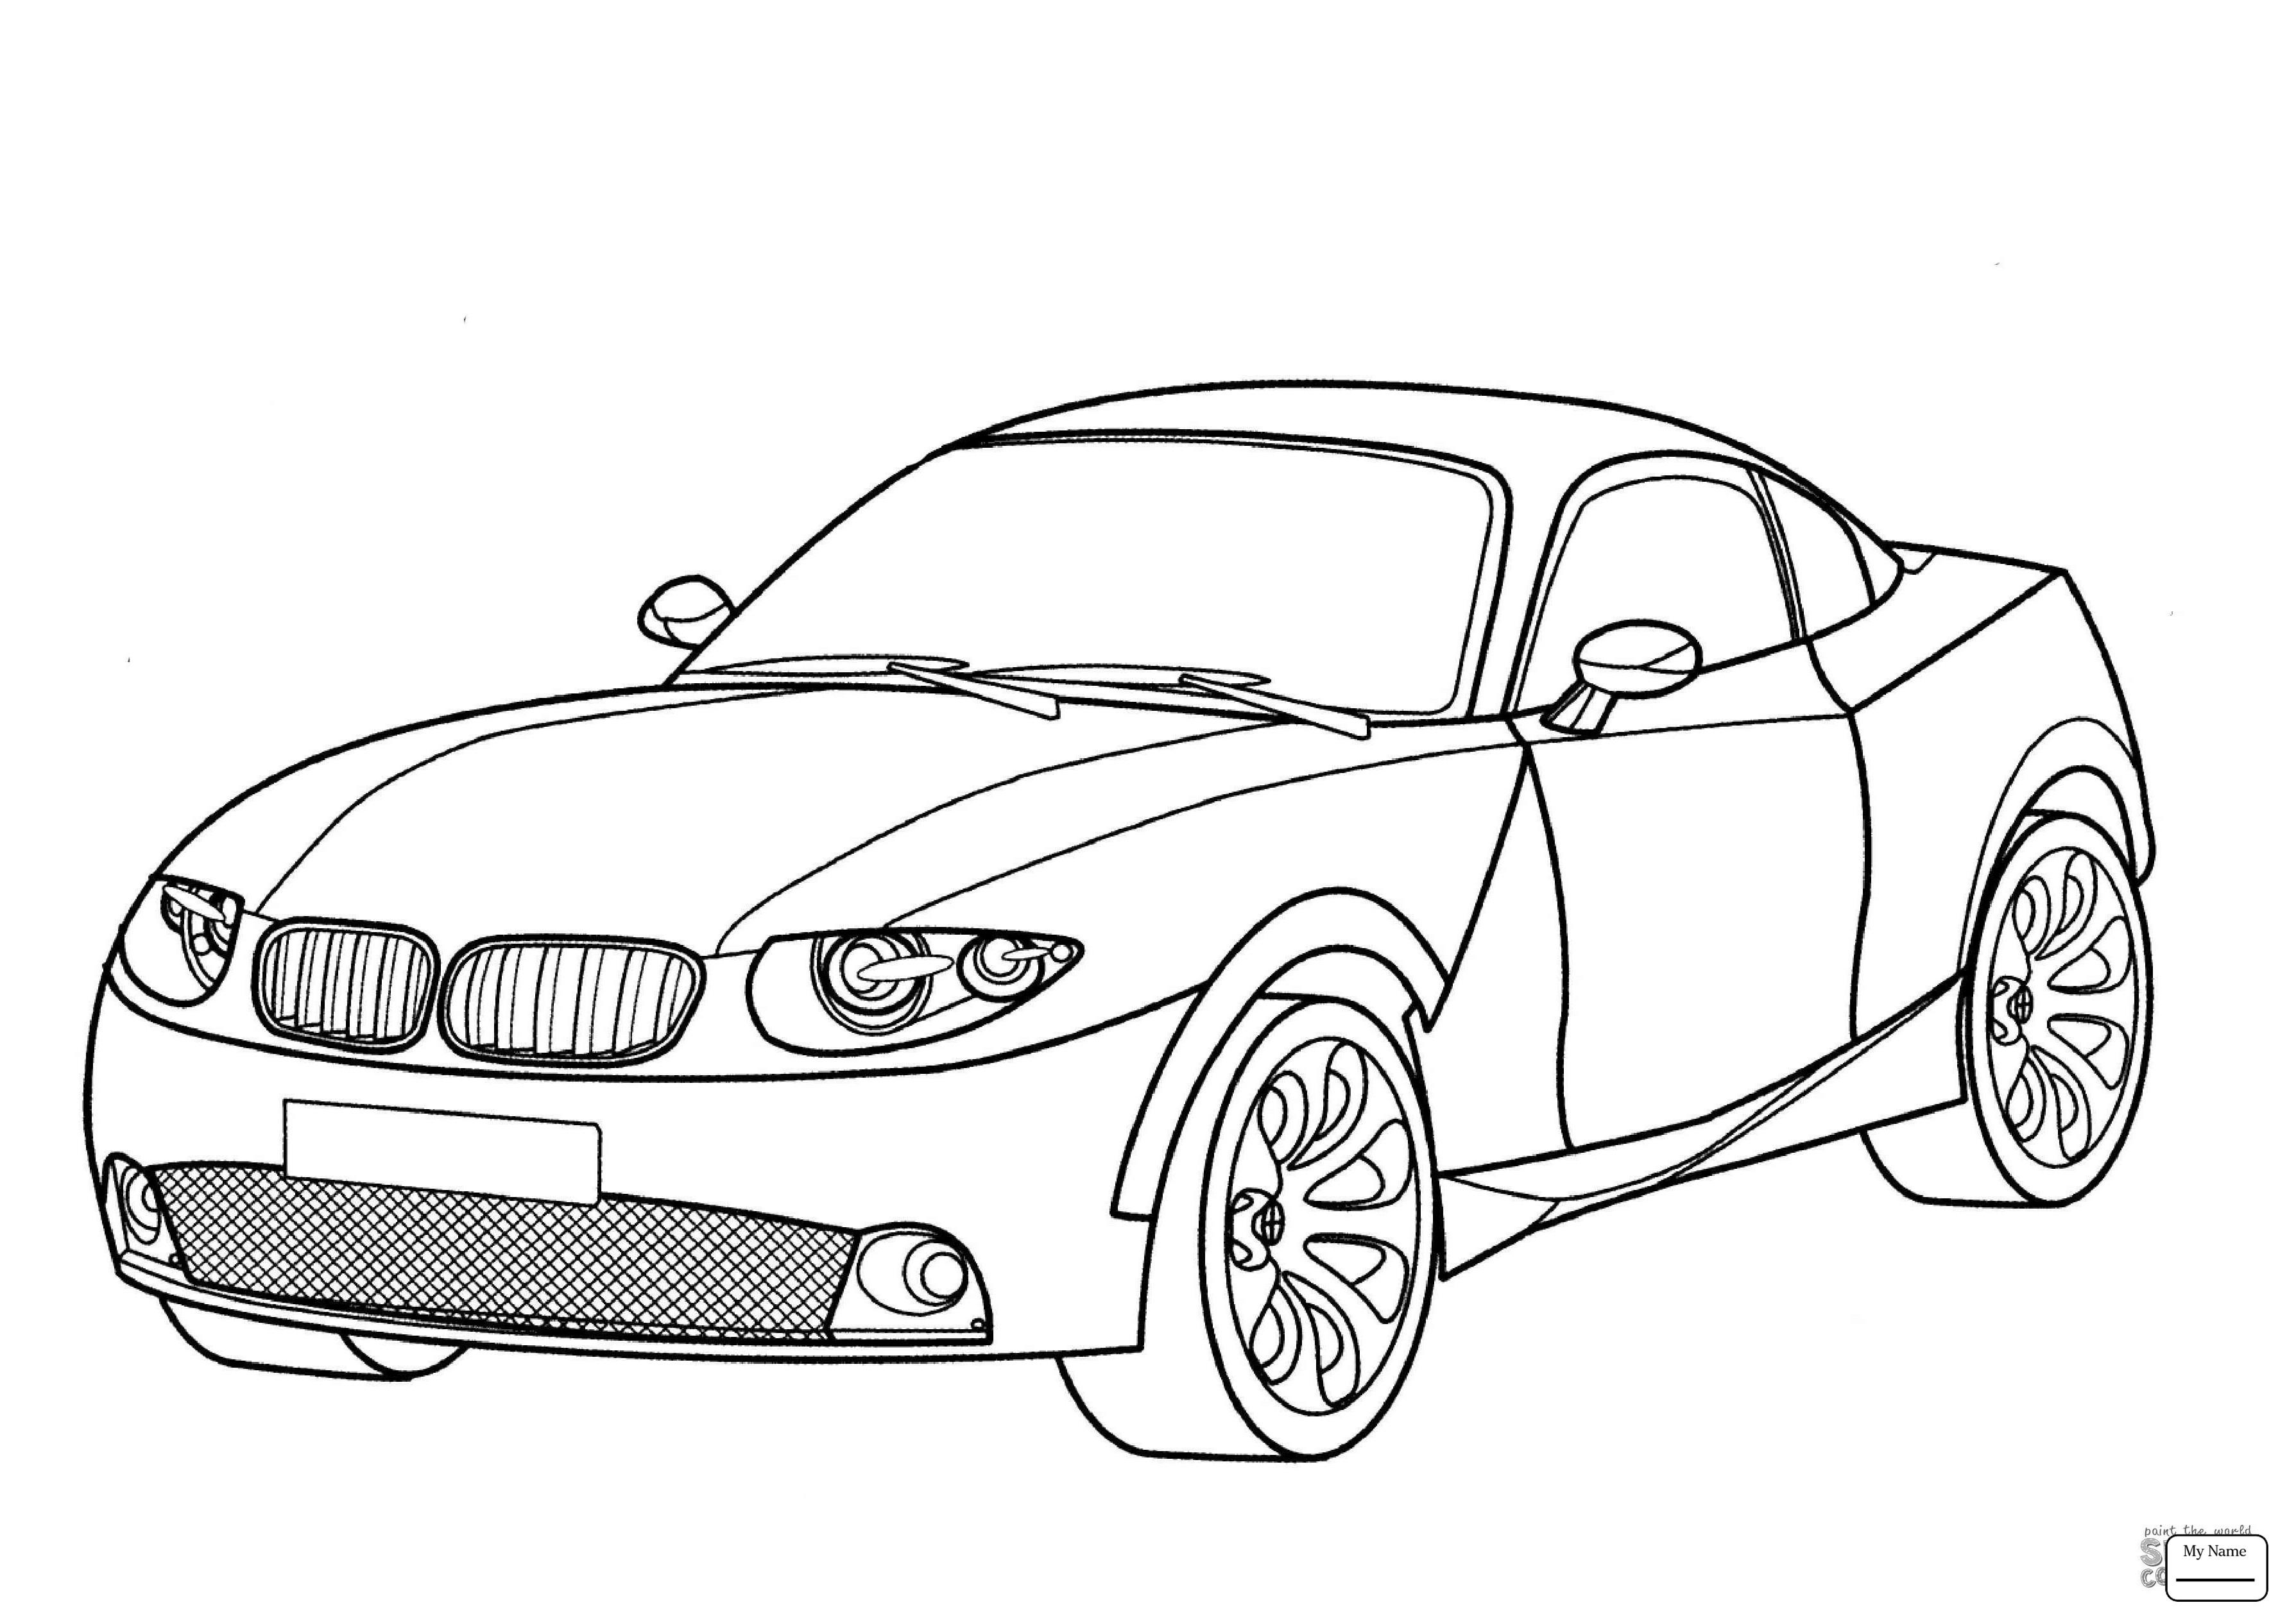 3578x2530 Super Car Bmw 750il Coloring Page For Kids Elegant Bmw Car